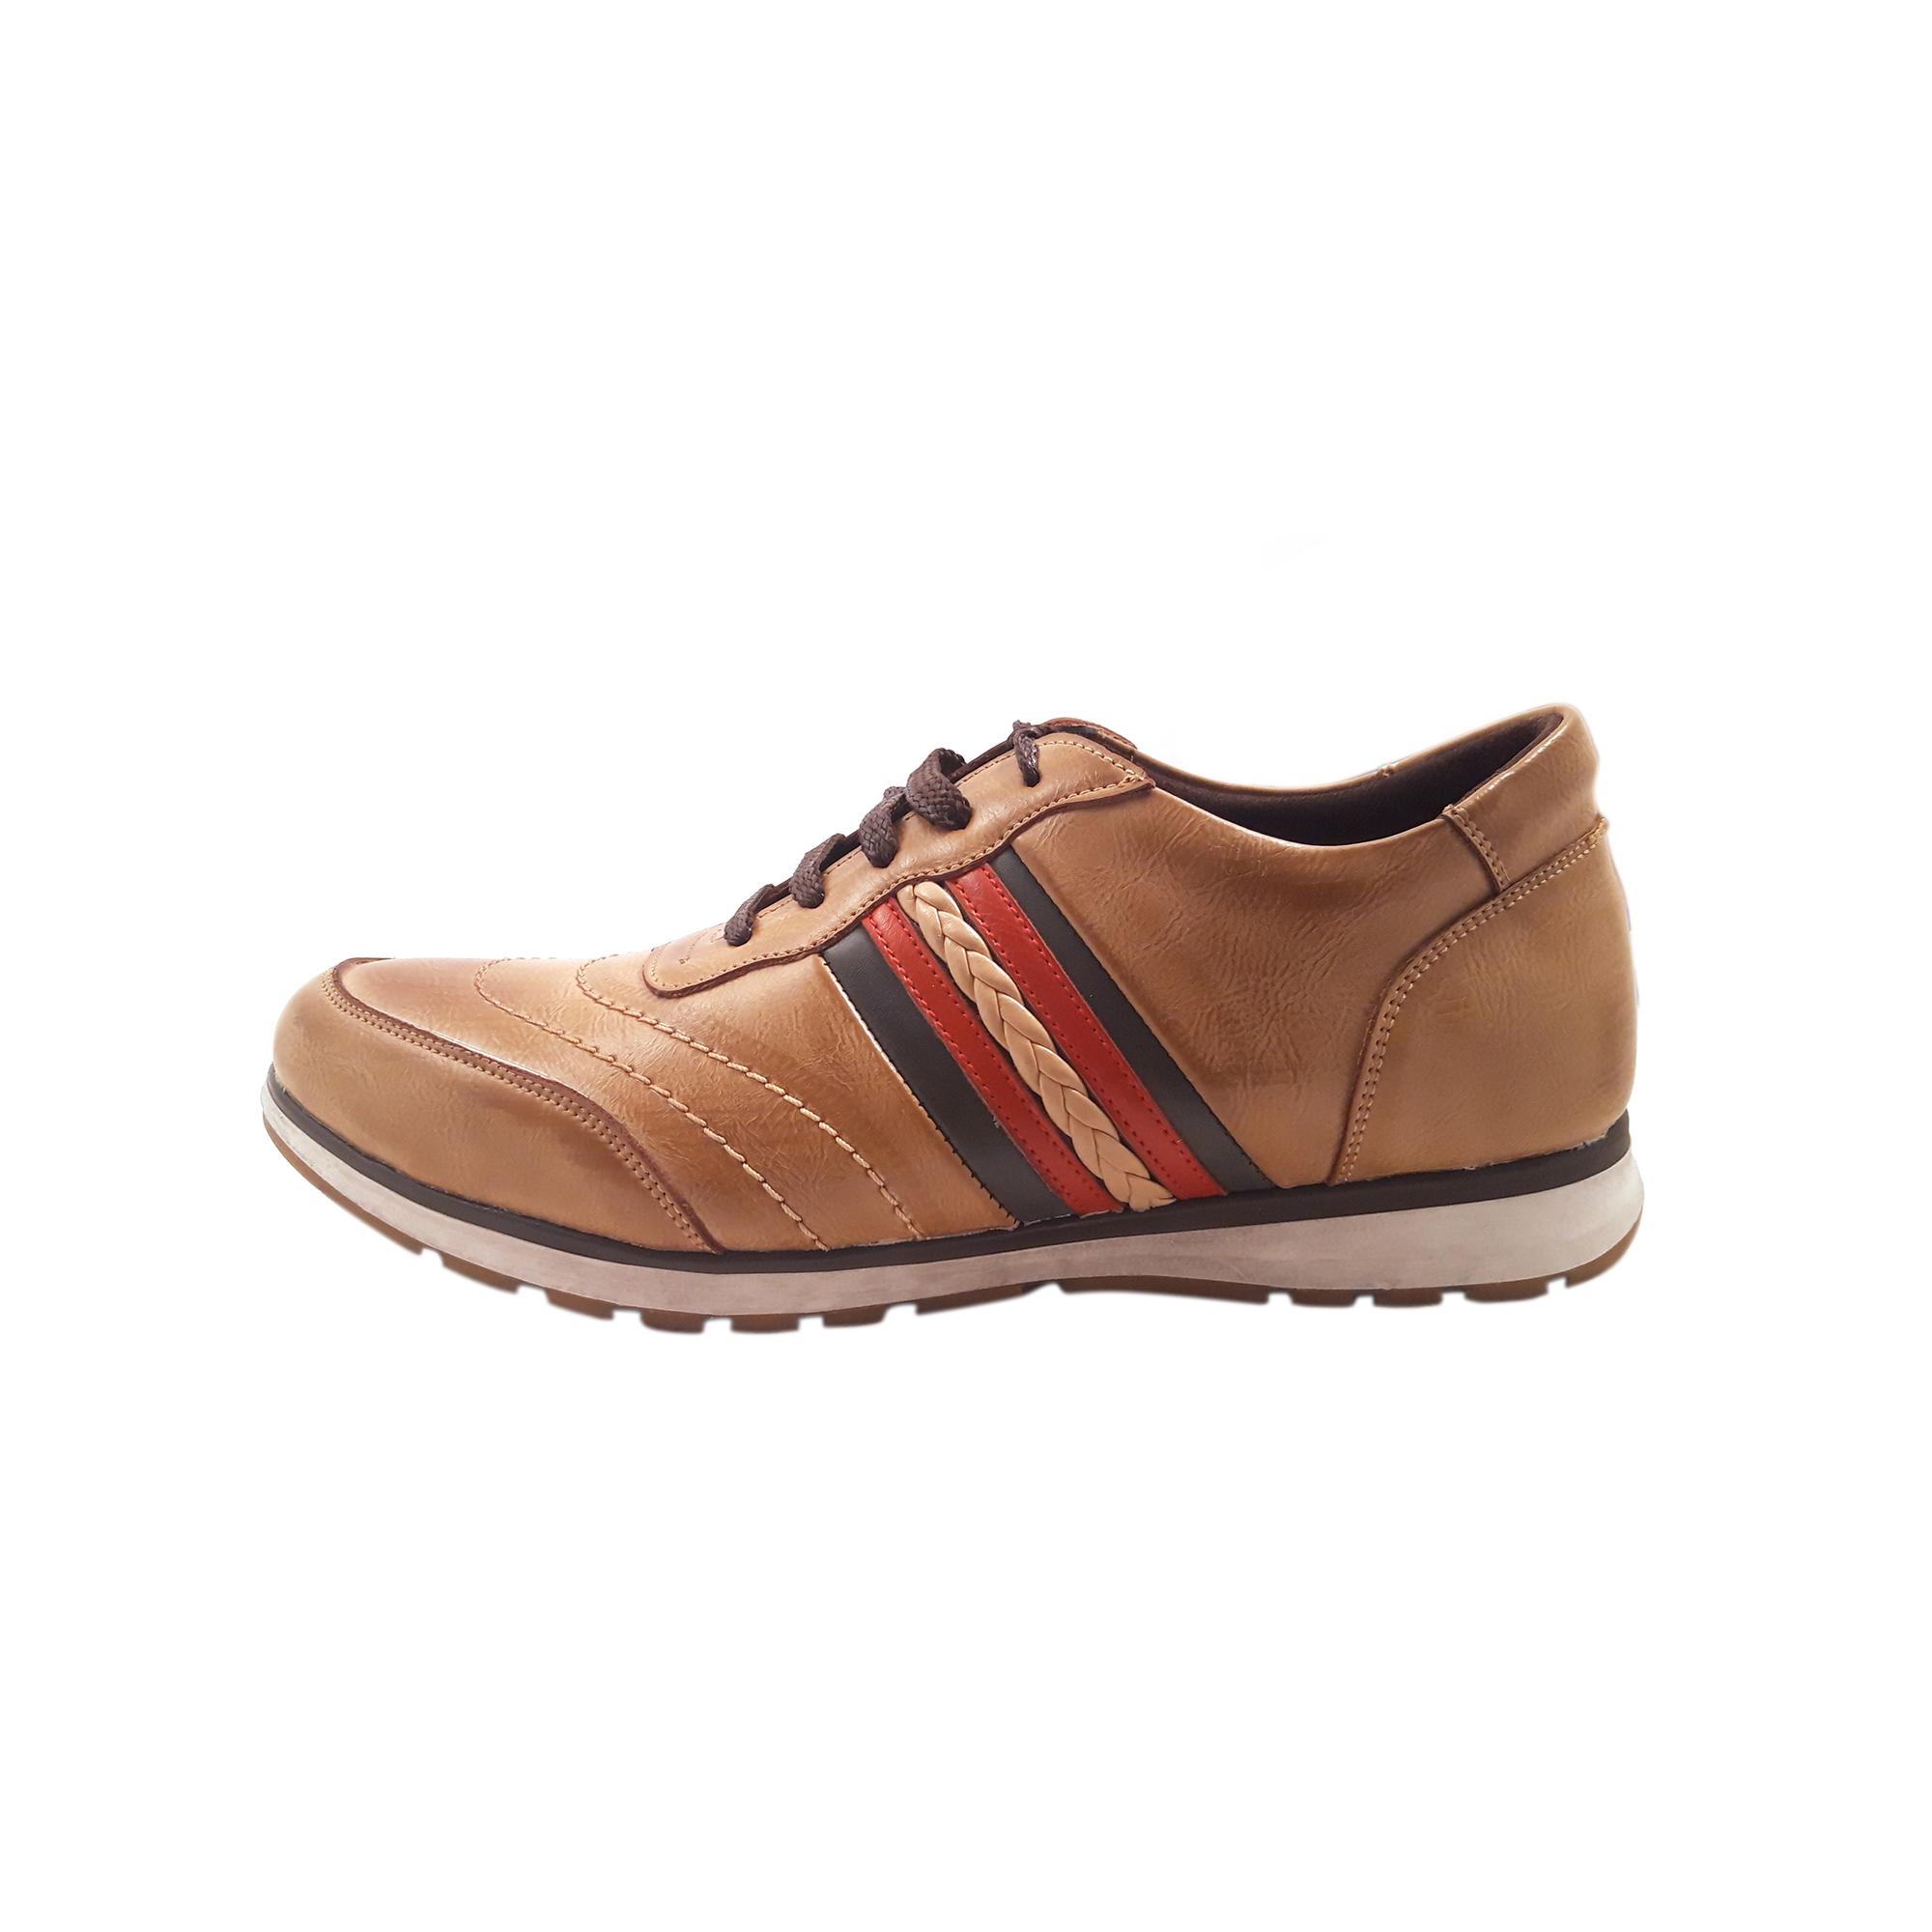 کفش روزمره مردانه مدل تکتاپ کد 3